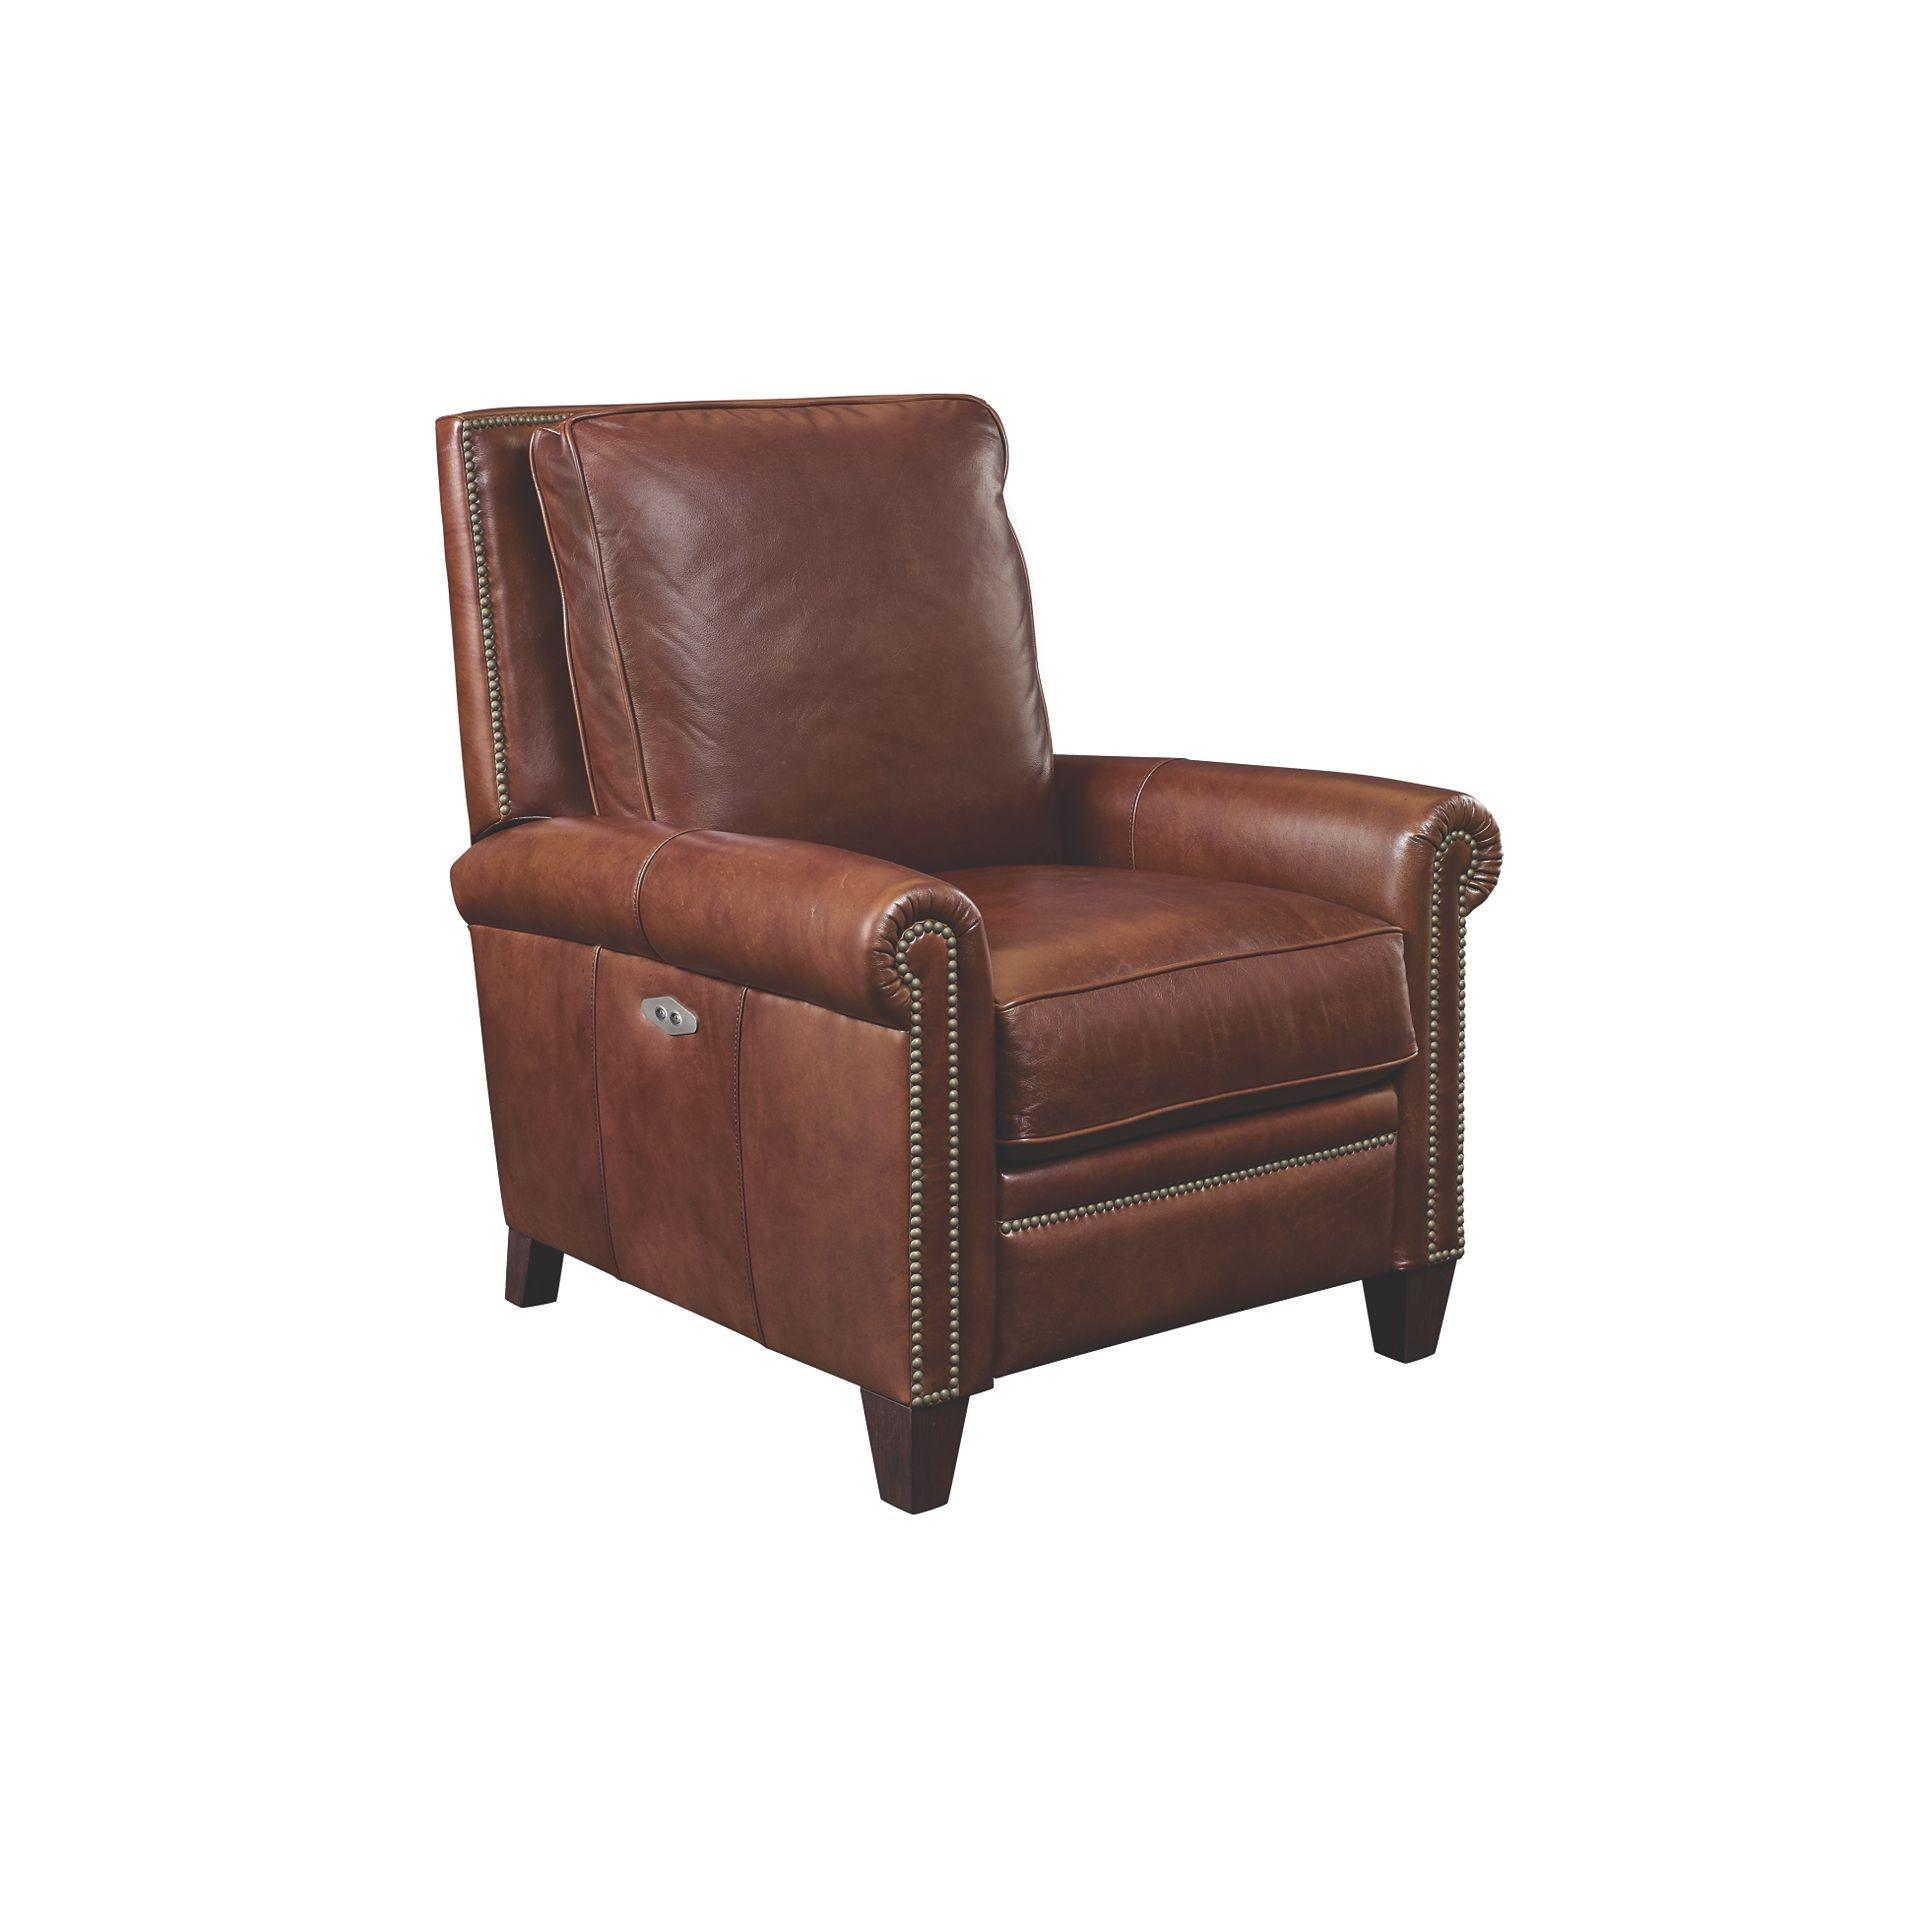 Superieur Henredon Furniture Henredon Leather Company Lugano Power Recliner IL8883 RE